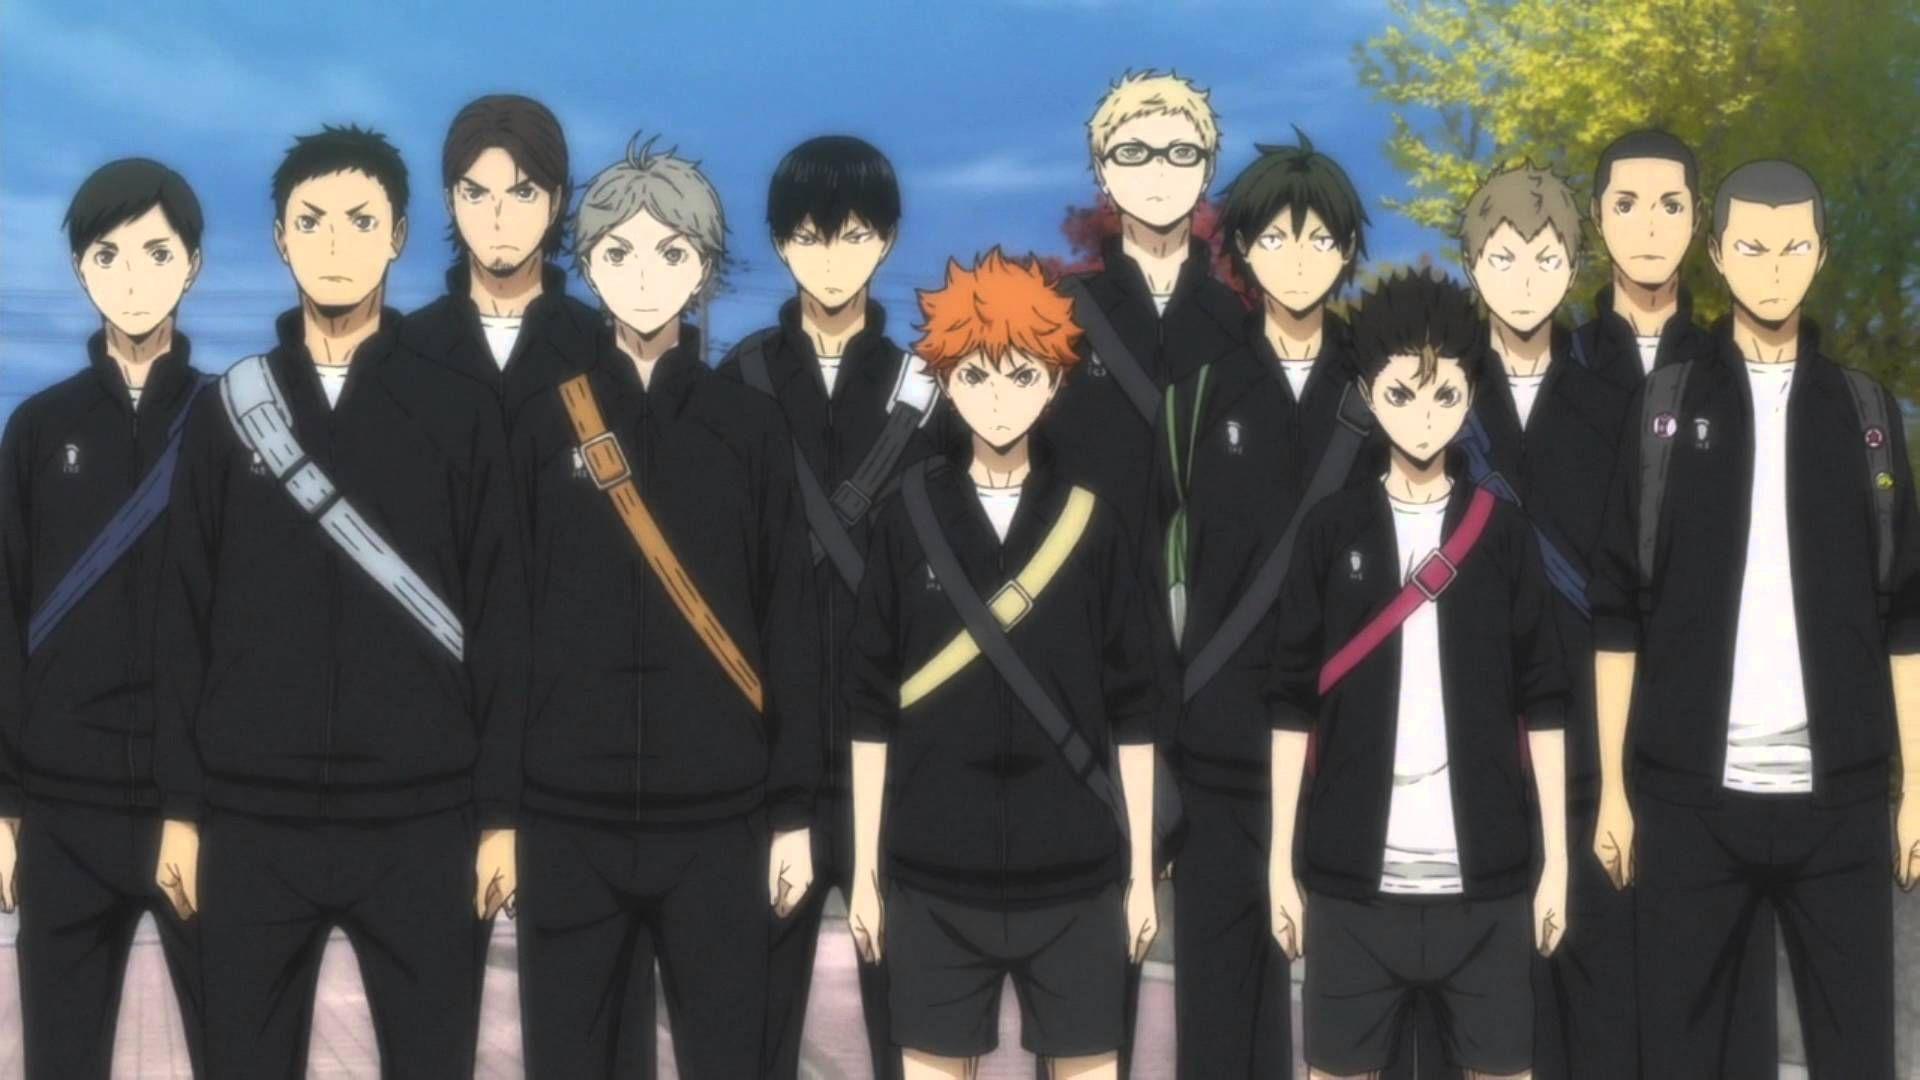 Ready For Battle We Will Win Haikyuu Haikyuu Karasuno Haikyuu Anime